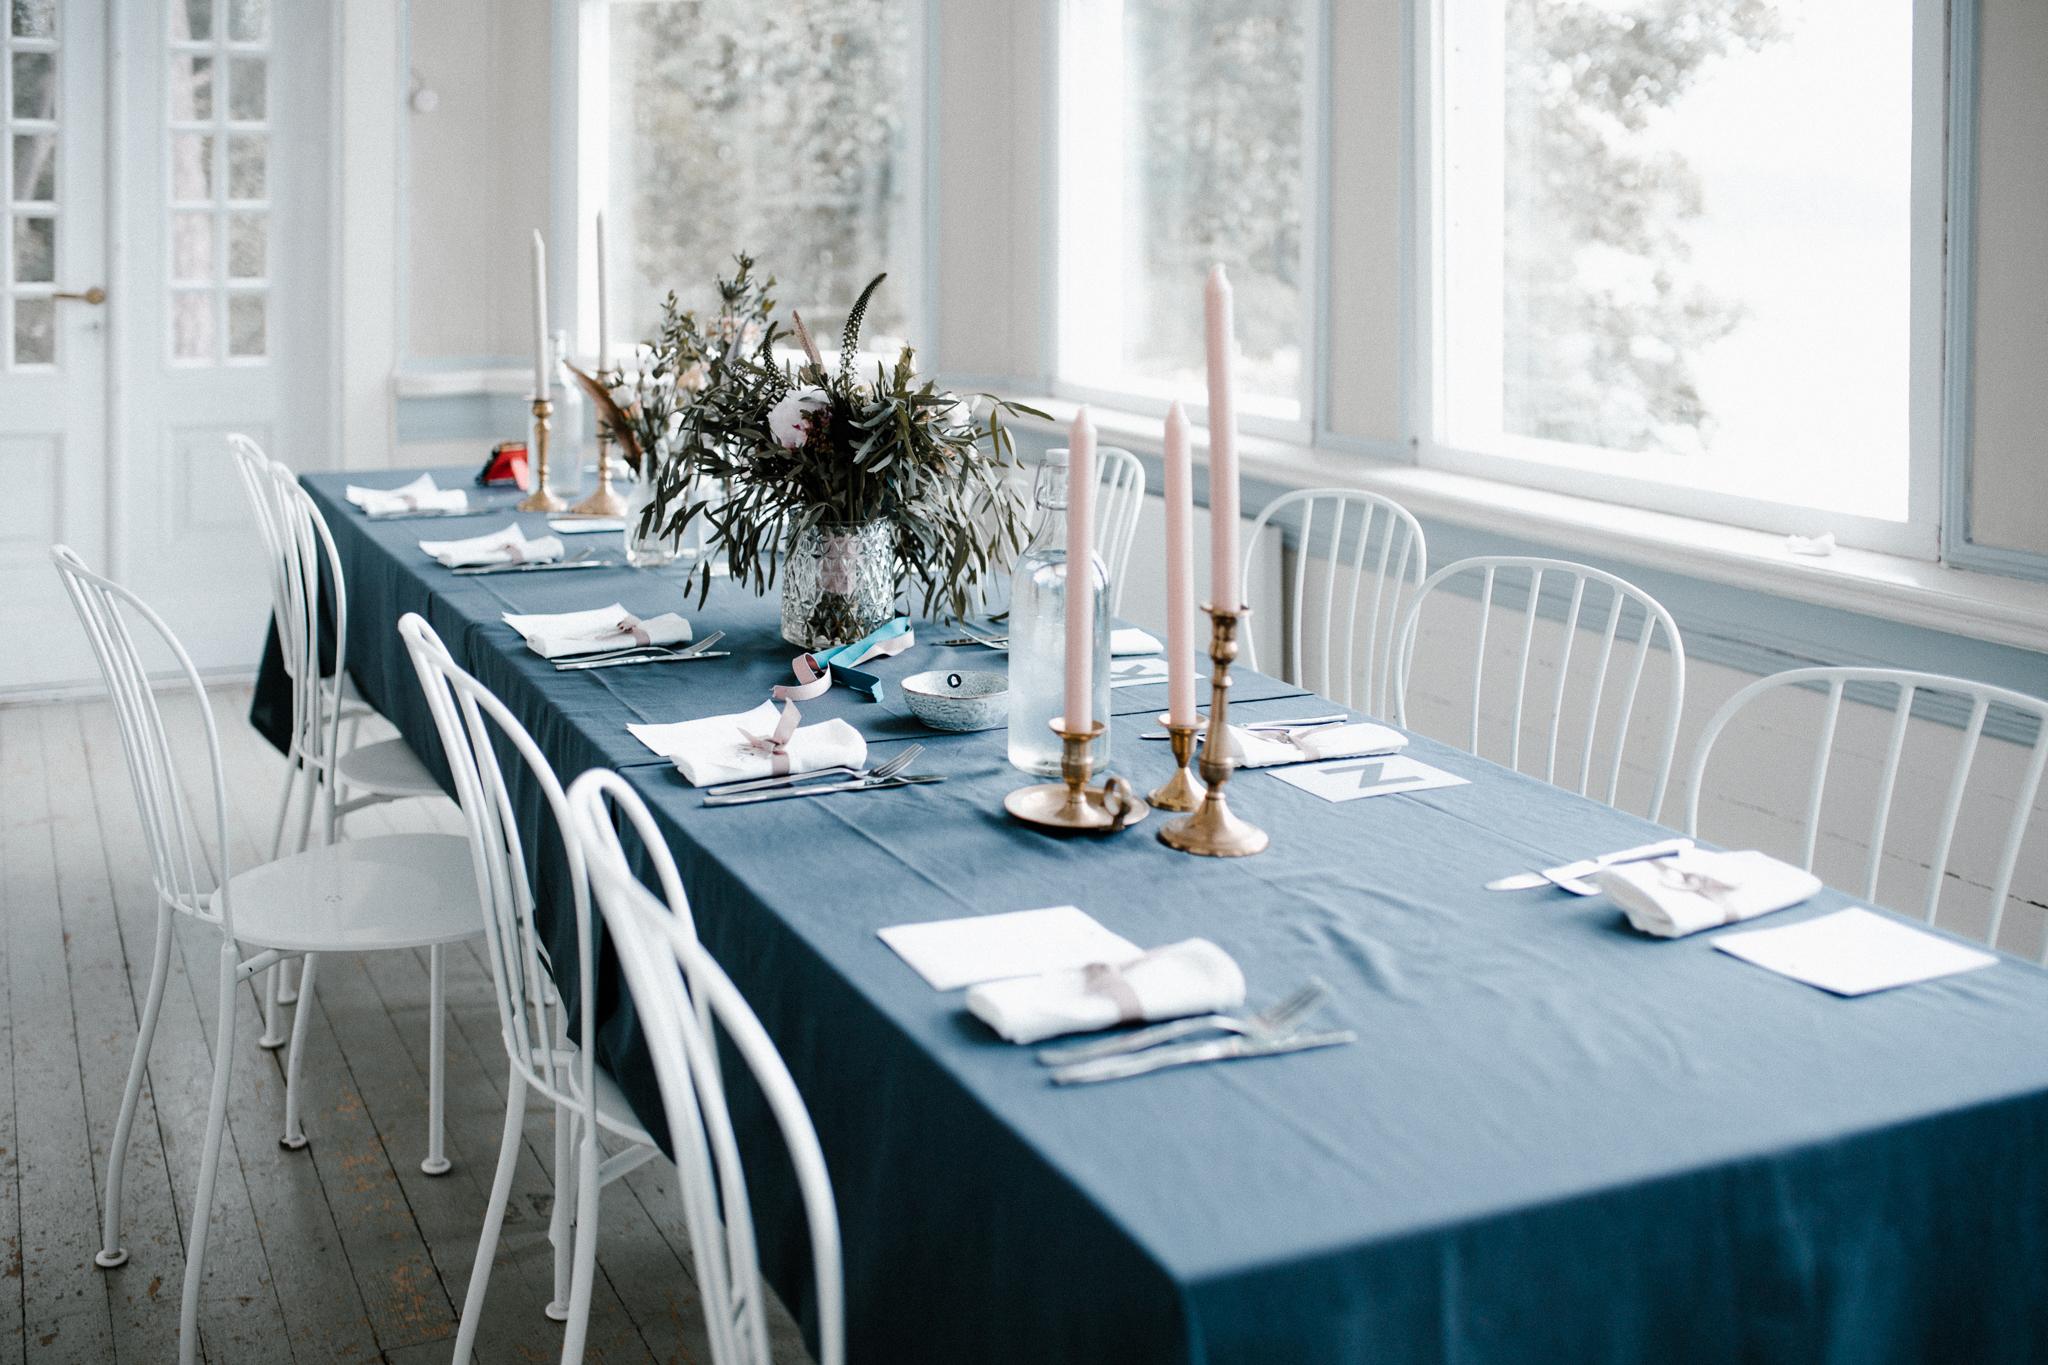 Noora + Kalle -- Photos by Patrick Karkkolainen Wedding Photographer-4.jpg